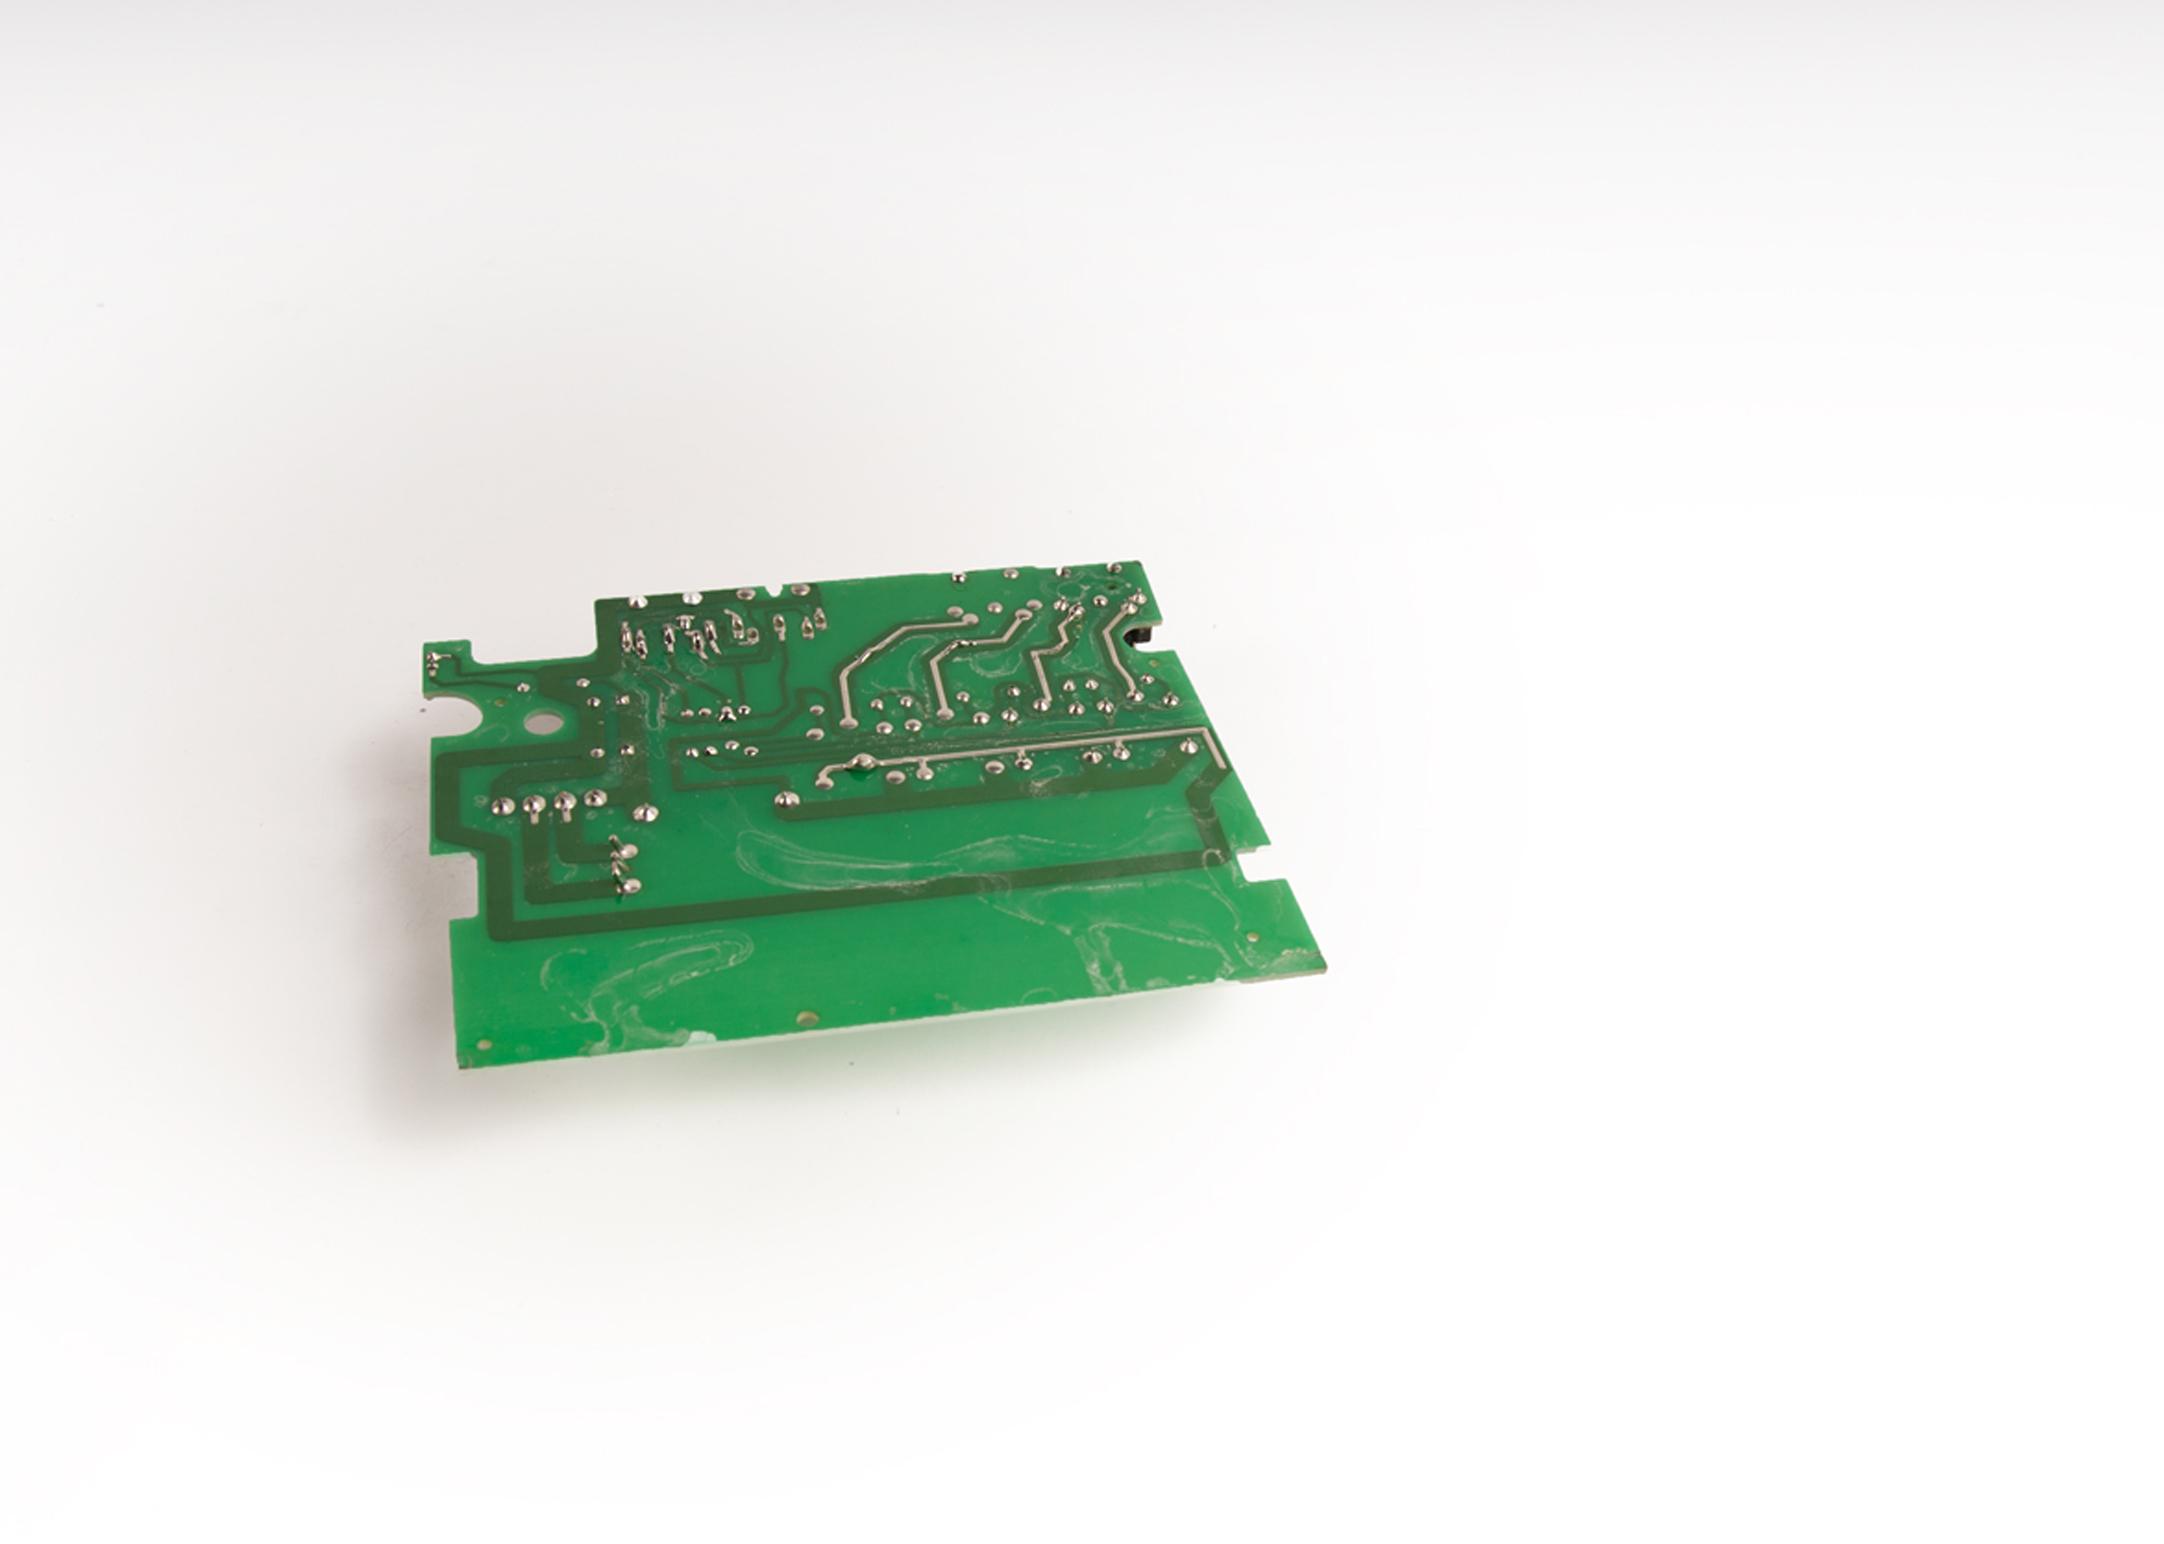 Groom-X PCB for Electric Table/Inox Bath